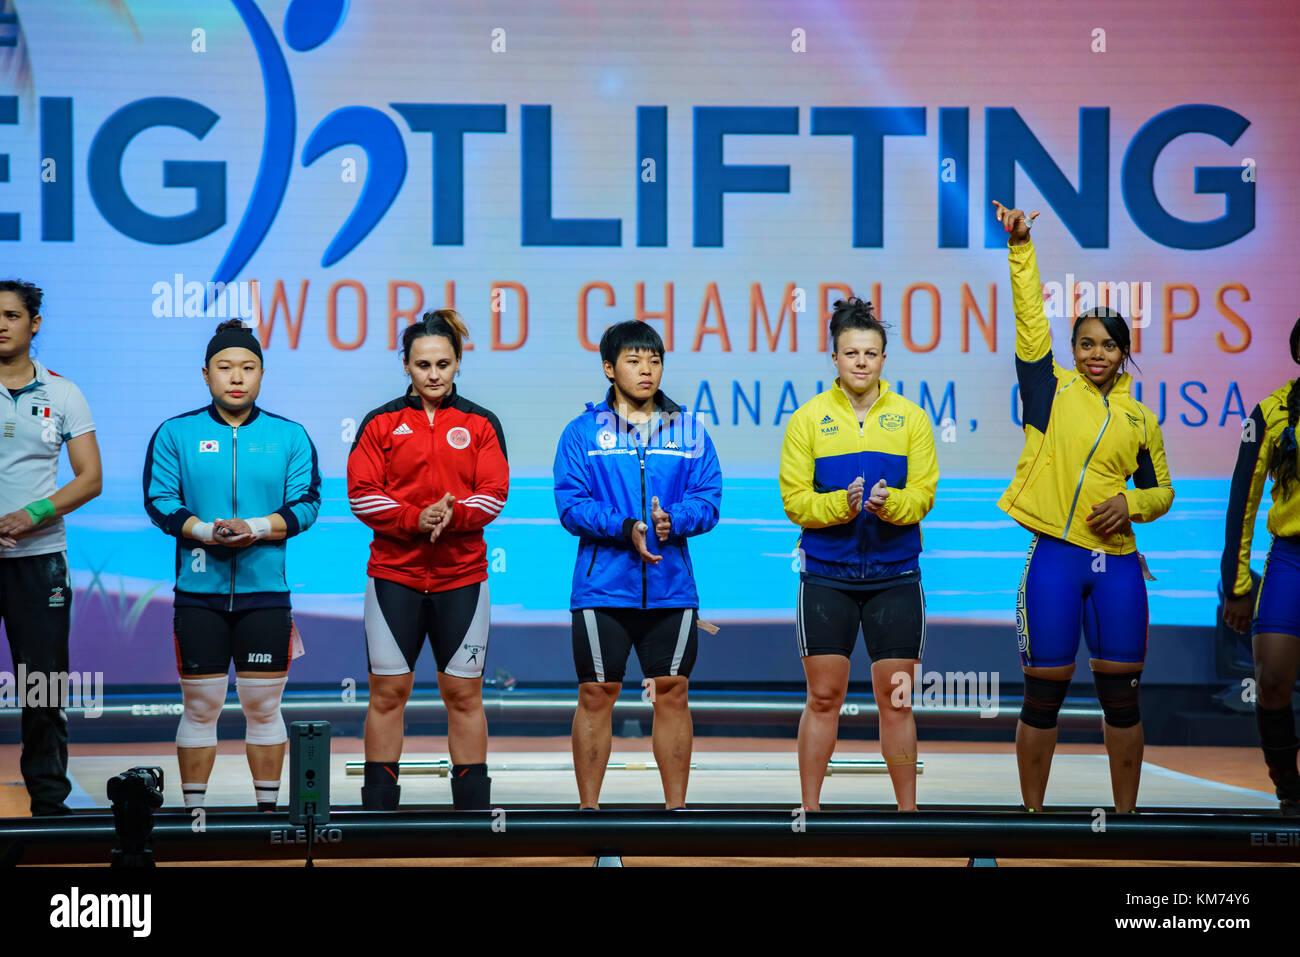 Anaheim, NOV 30: 2017 Athletes of International Weightlifting Federation World Championships on NOV 30, 2017 at - Stock Image